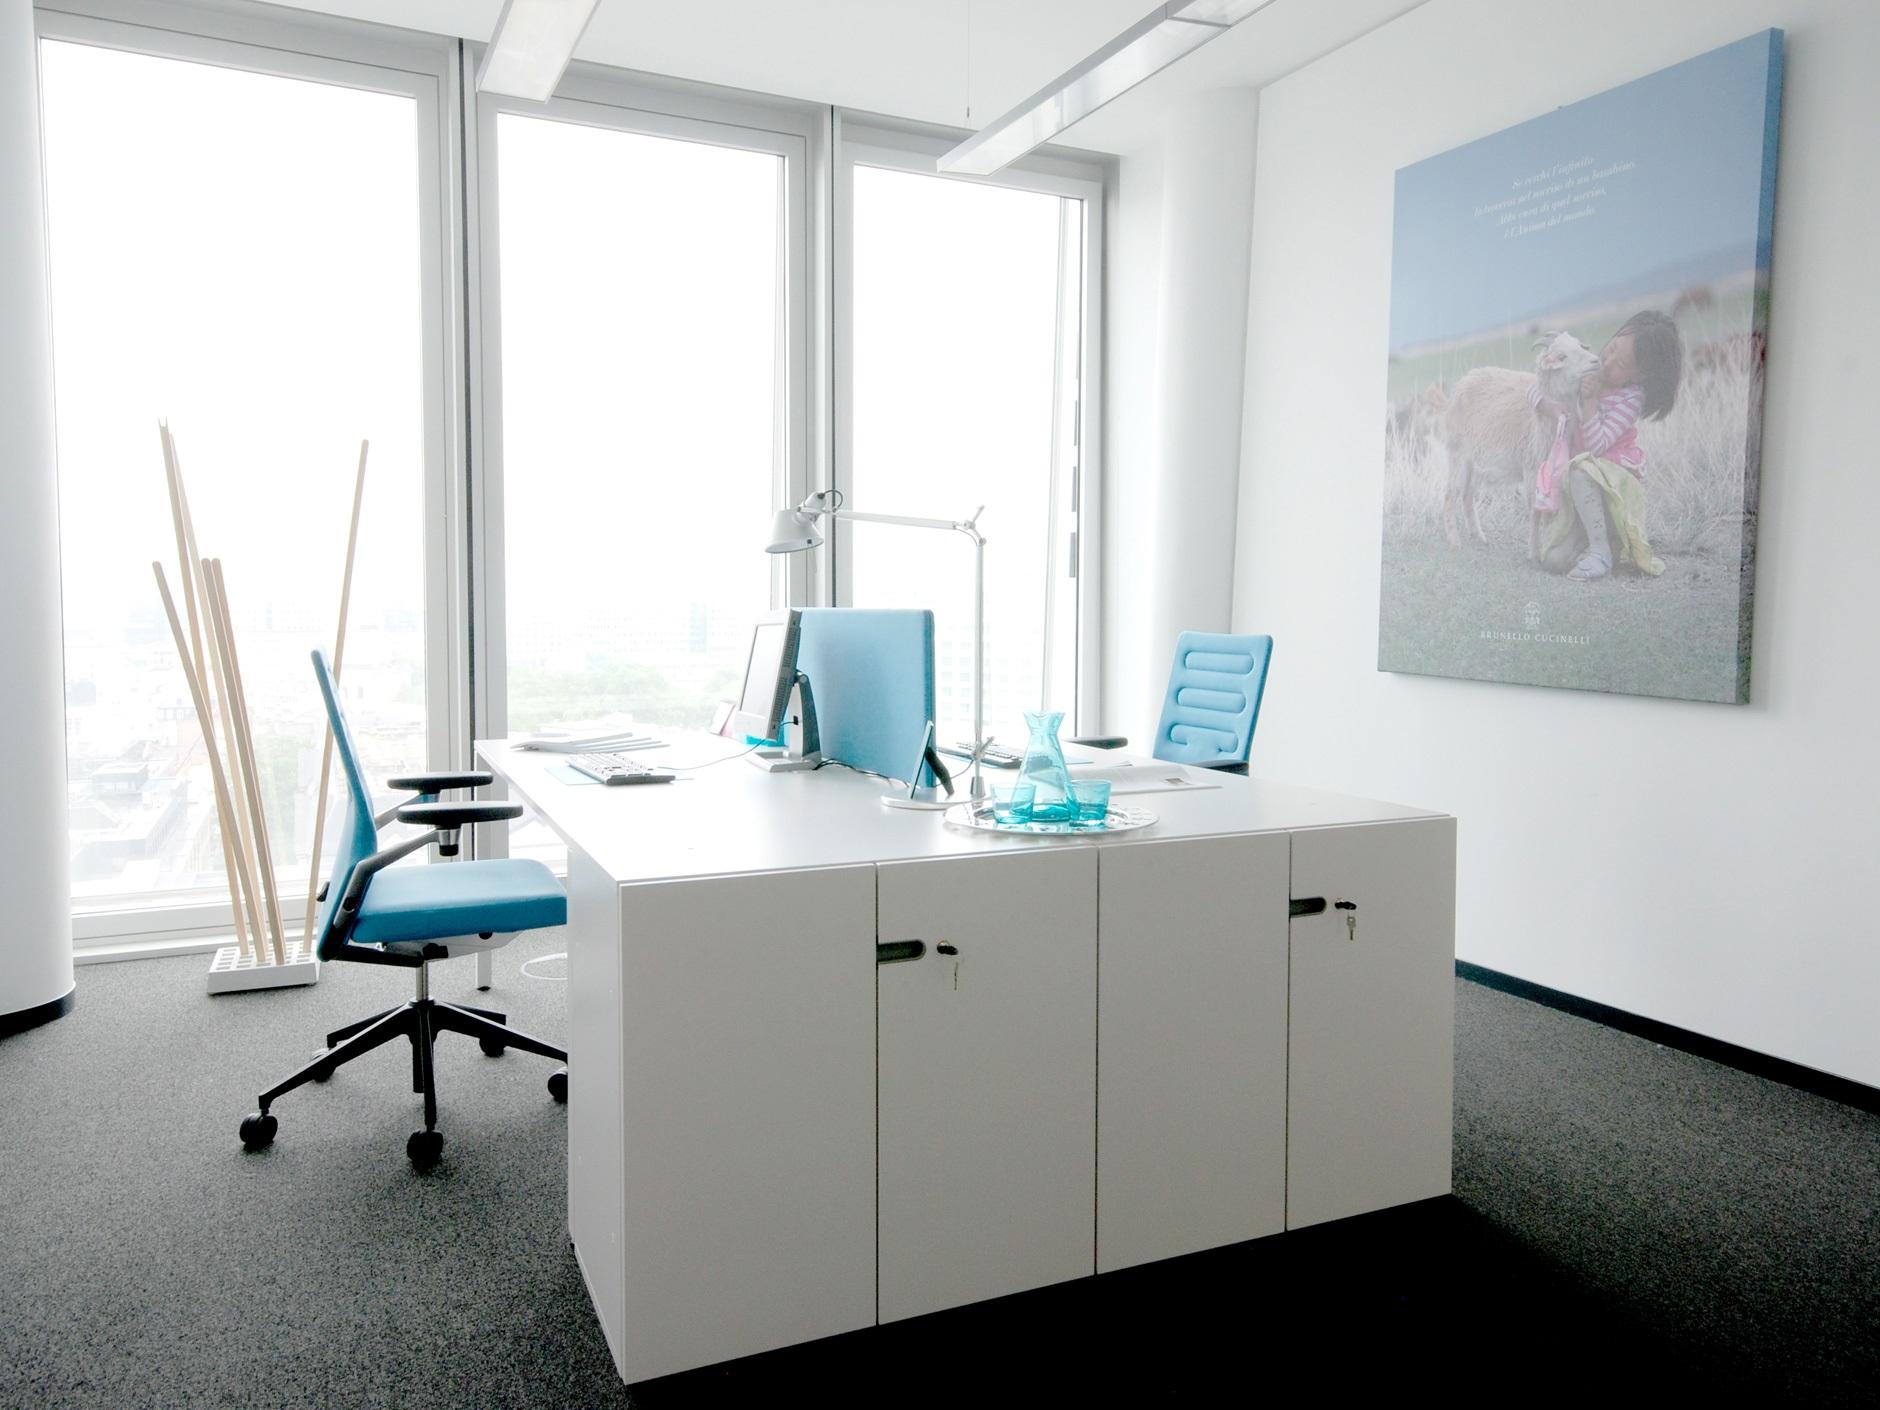 Modernes Büro Design | lamictals.com